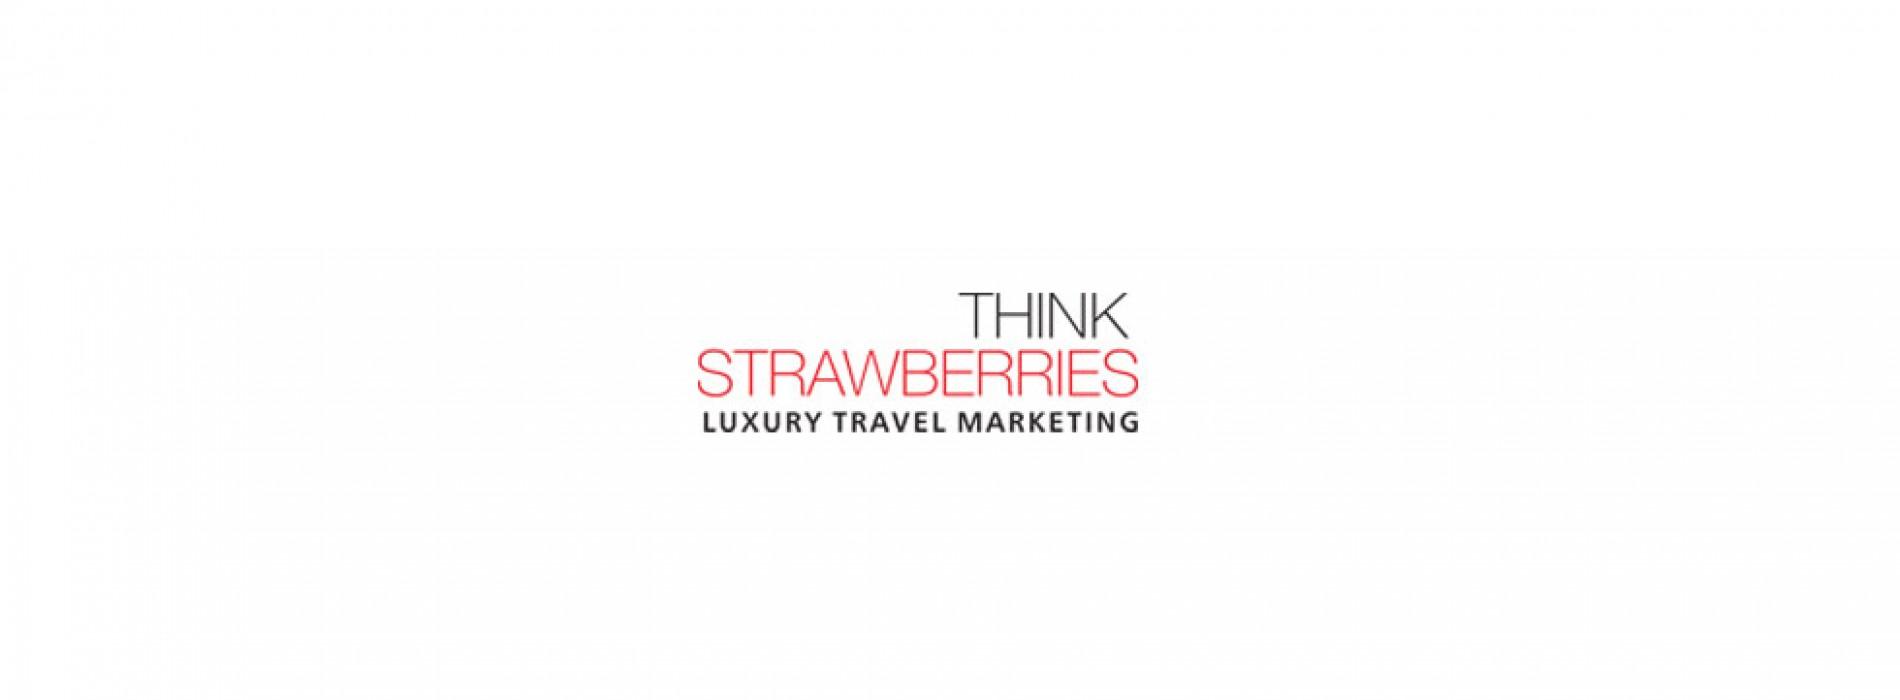 Think Strawberries celebrates its anniversary